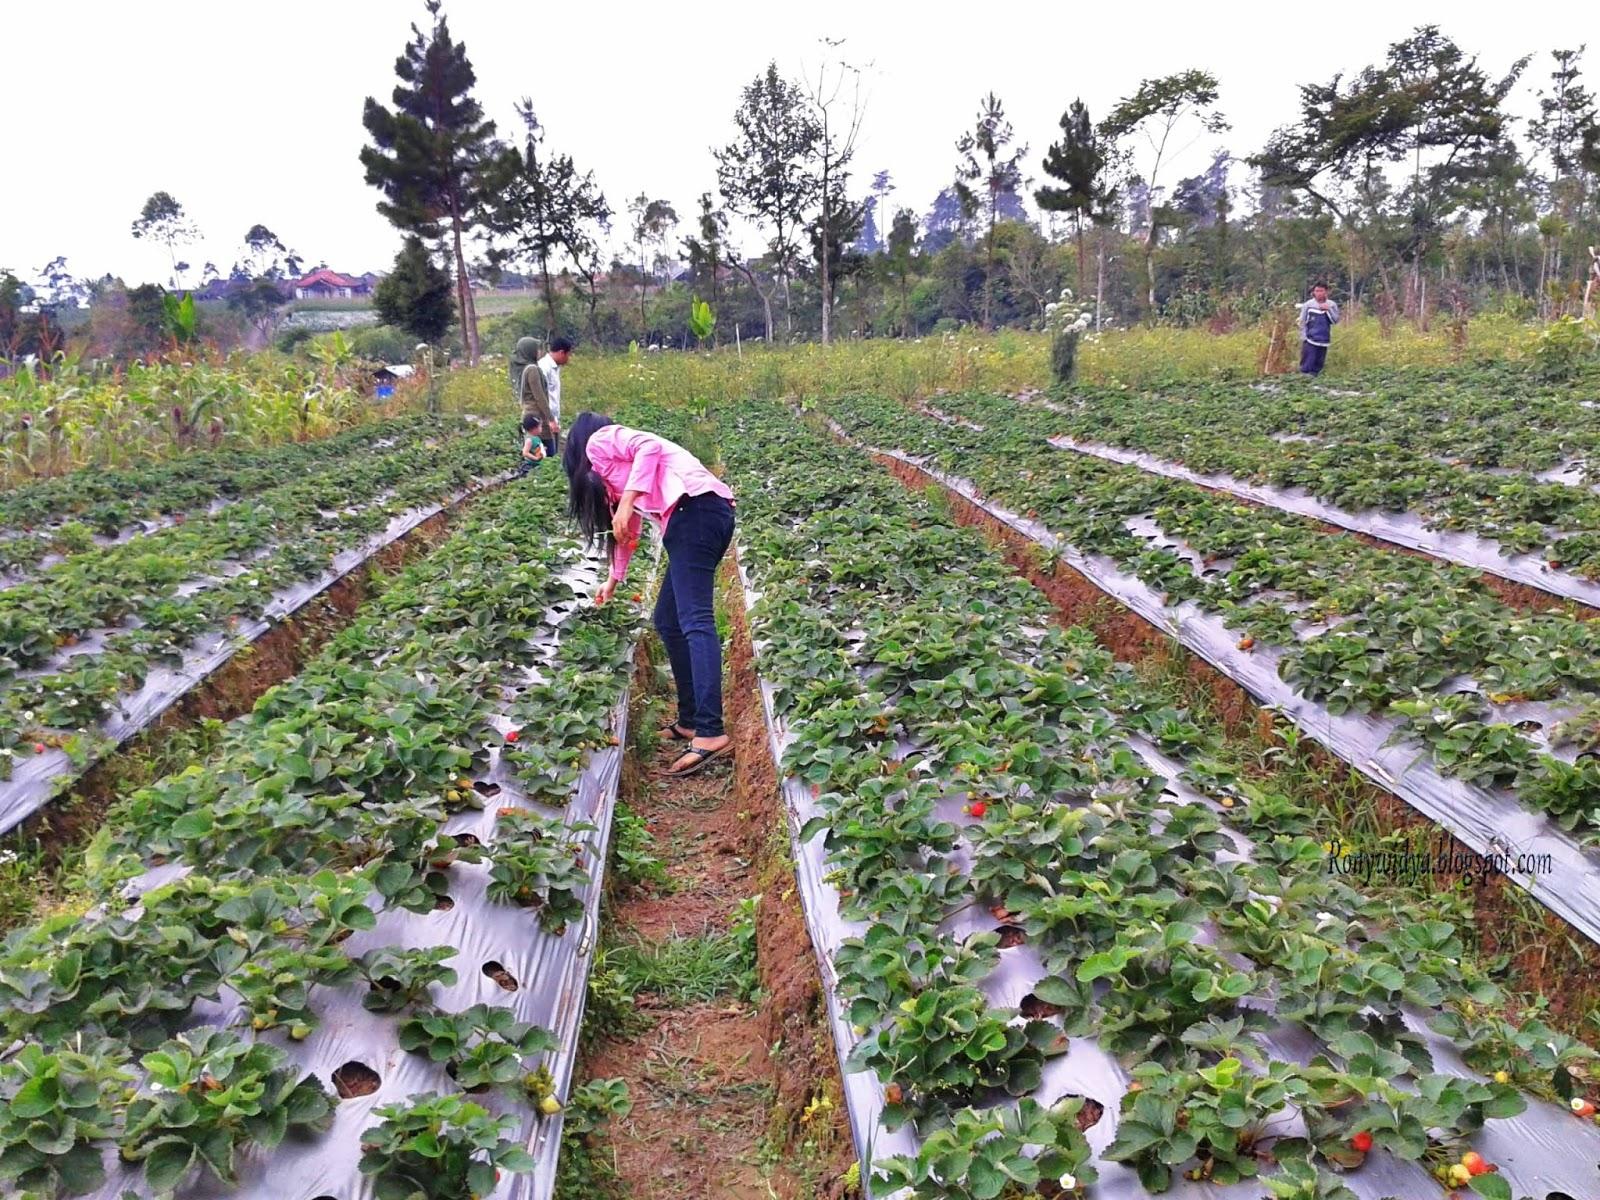 Lowongan Kerja Perkebunan Februari 2013 Lowongan Kerja Pt Petro Jordan Abadi Agustus 2016 Terbaru Kebun Strawberry Agrowisata Di Purbalingga Ronny Widya